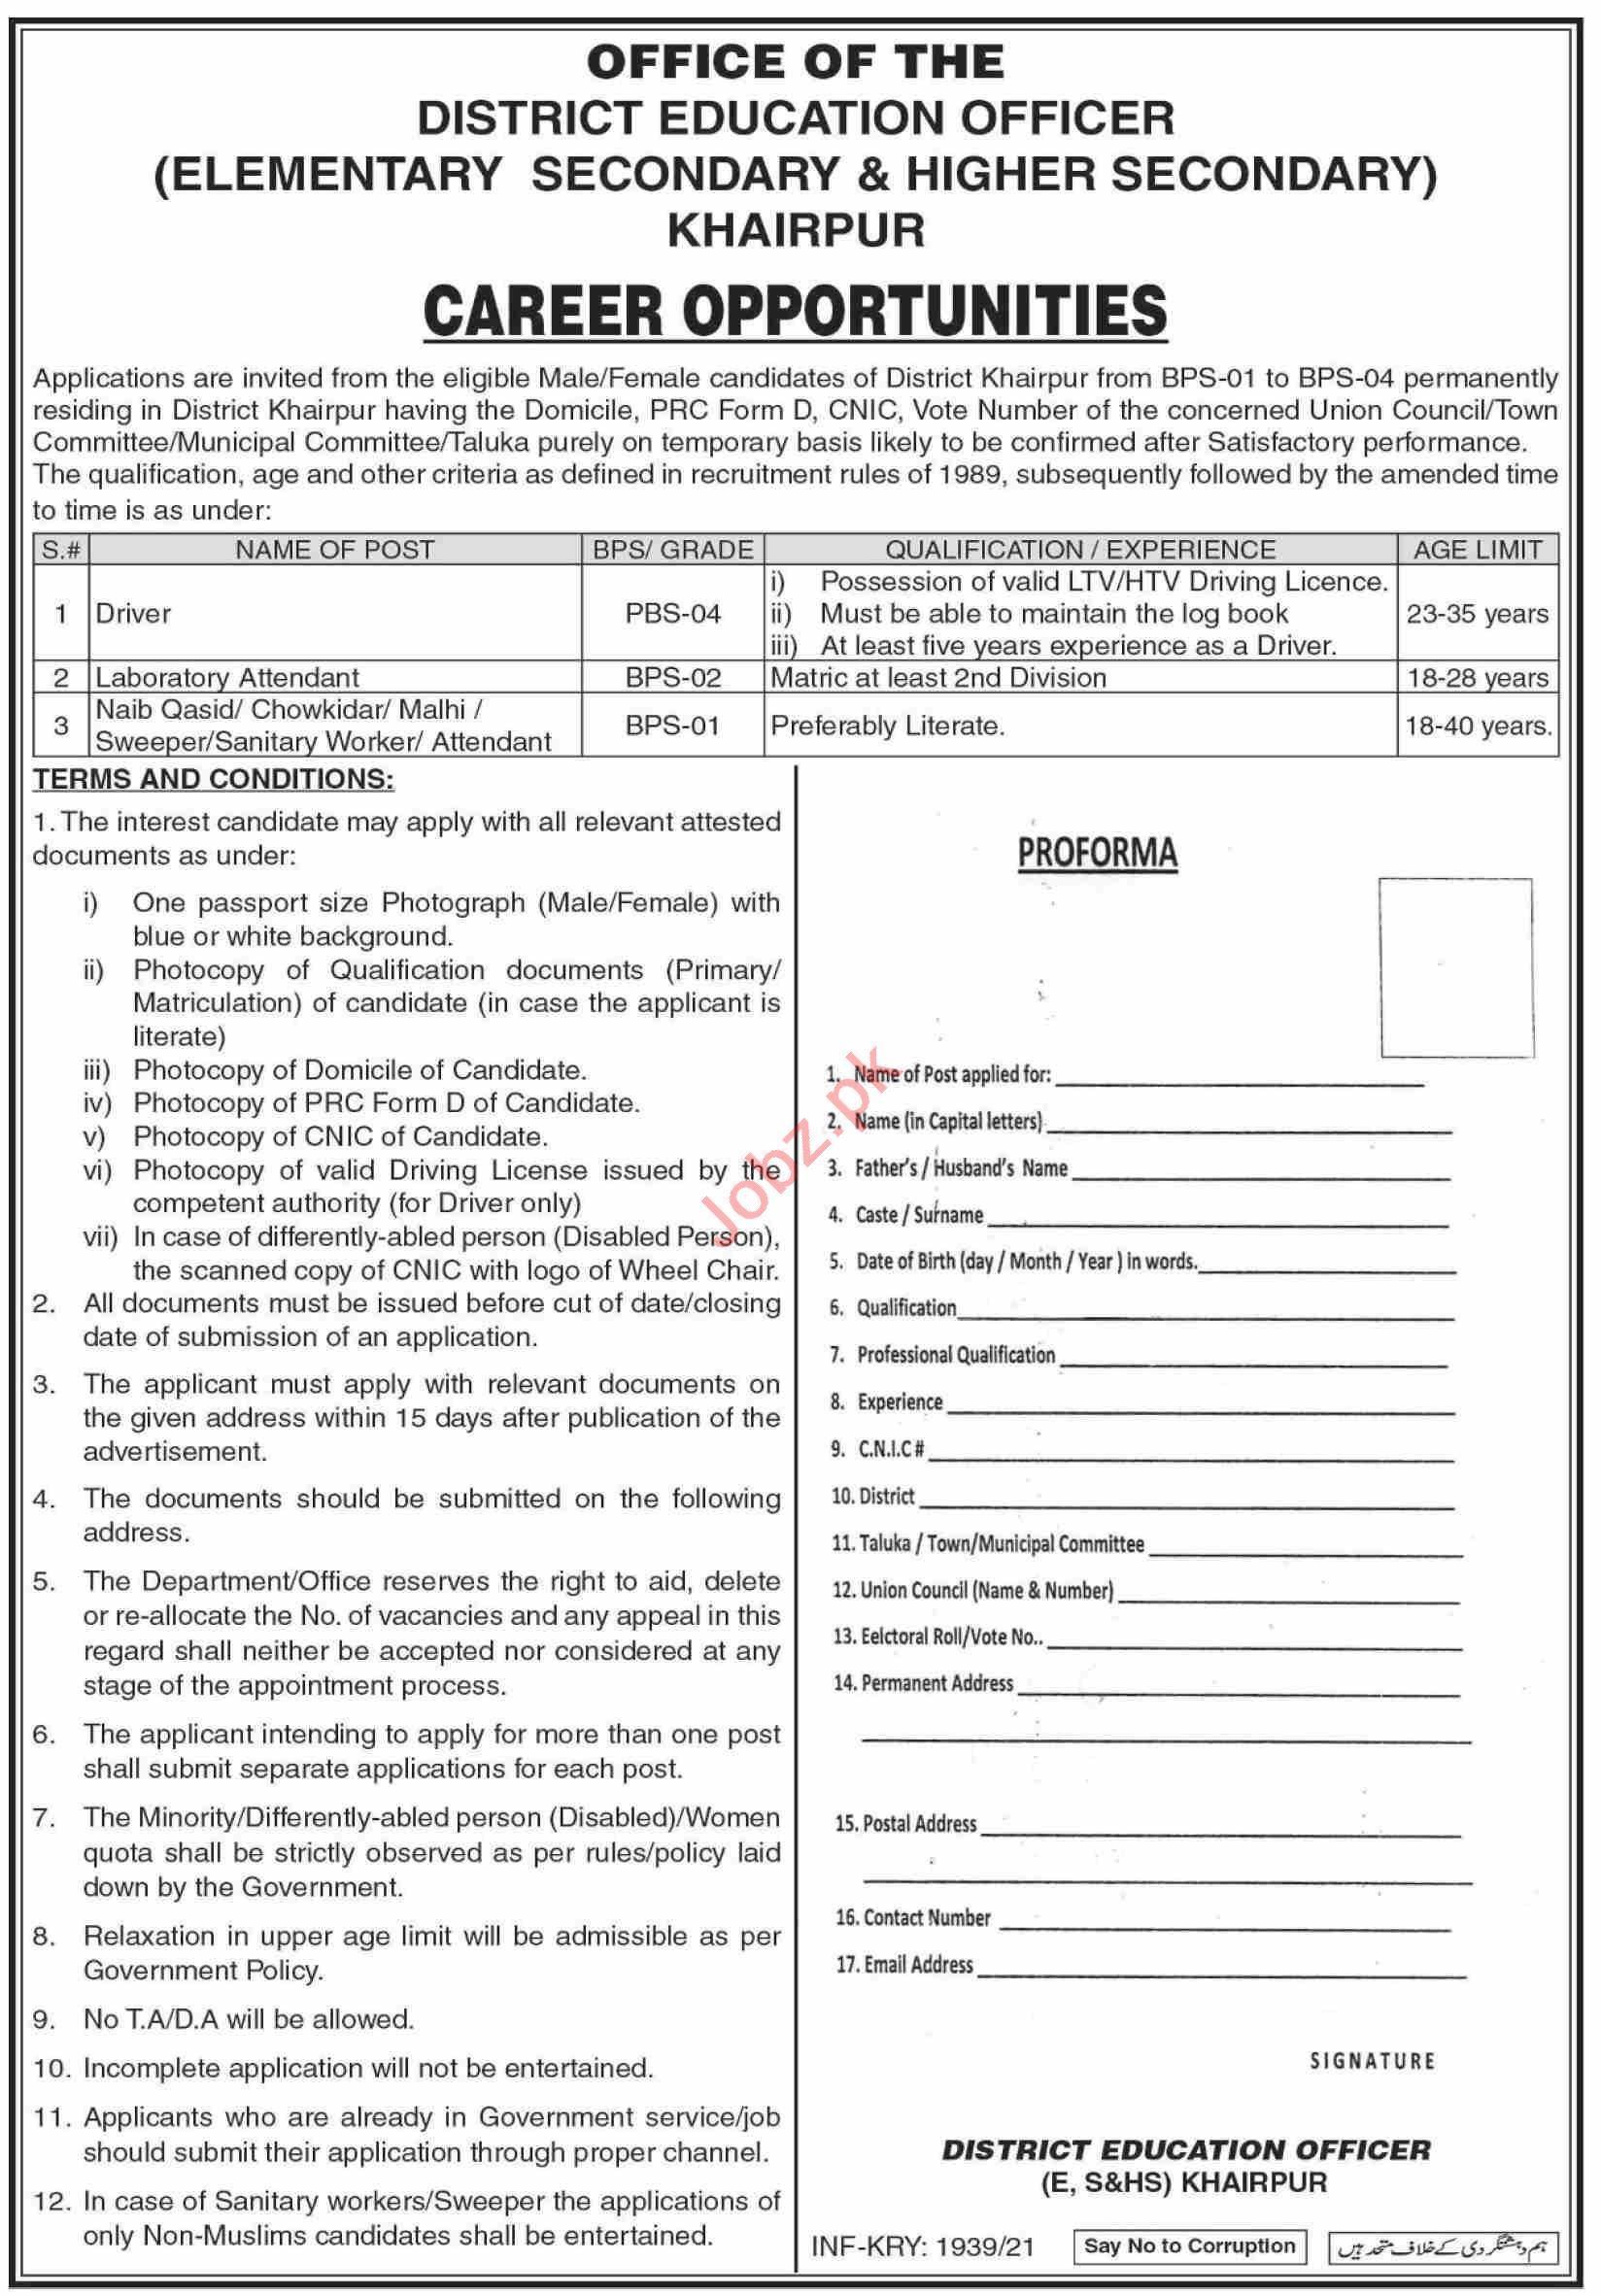 Elementary Secondary & Higher Secondary Khairpur Jobs 2021